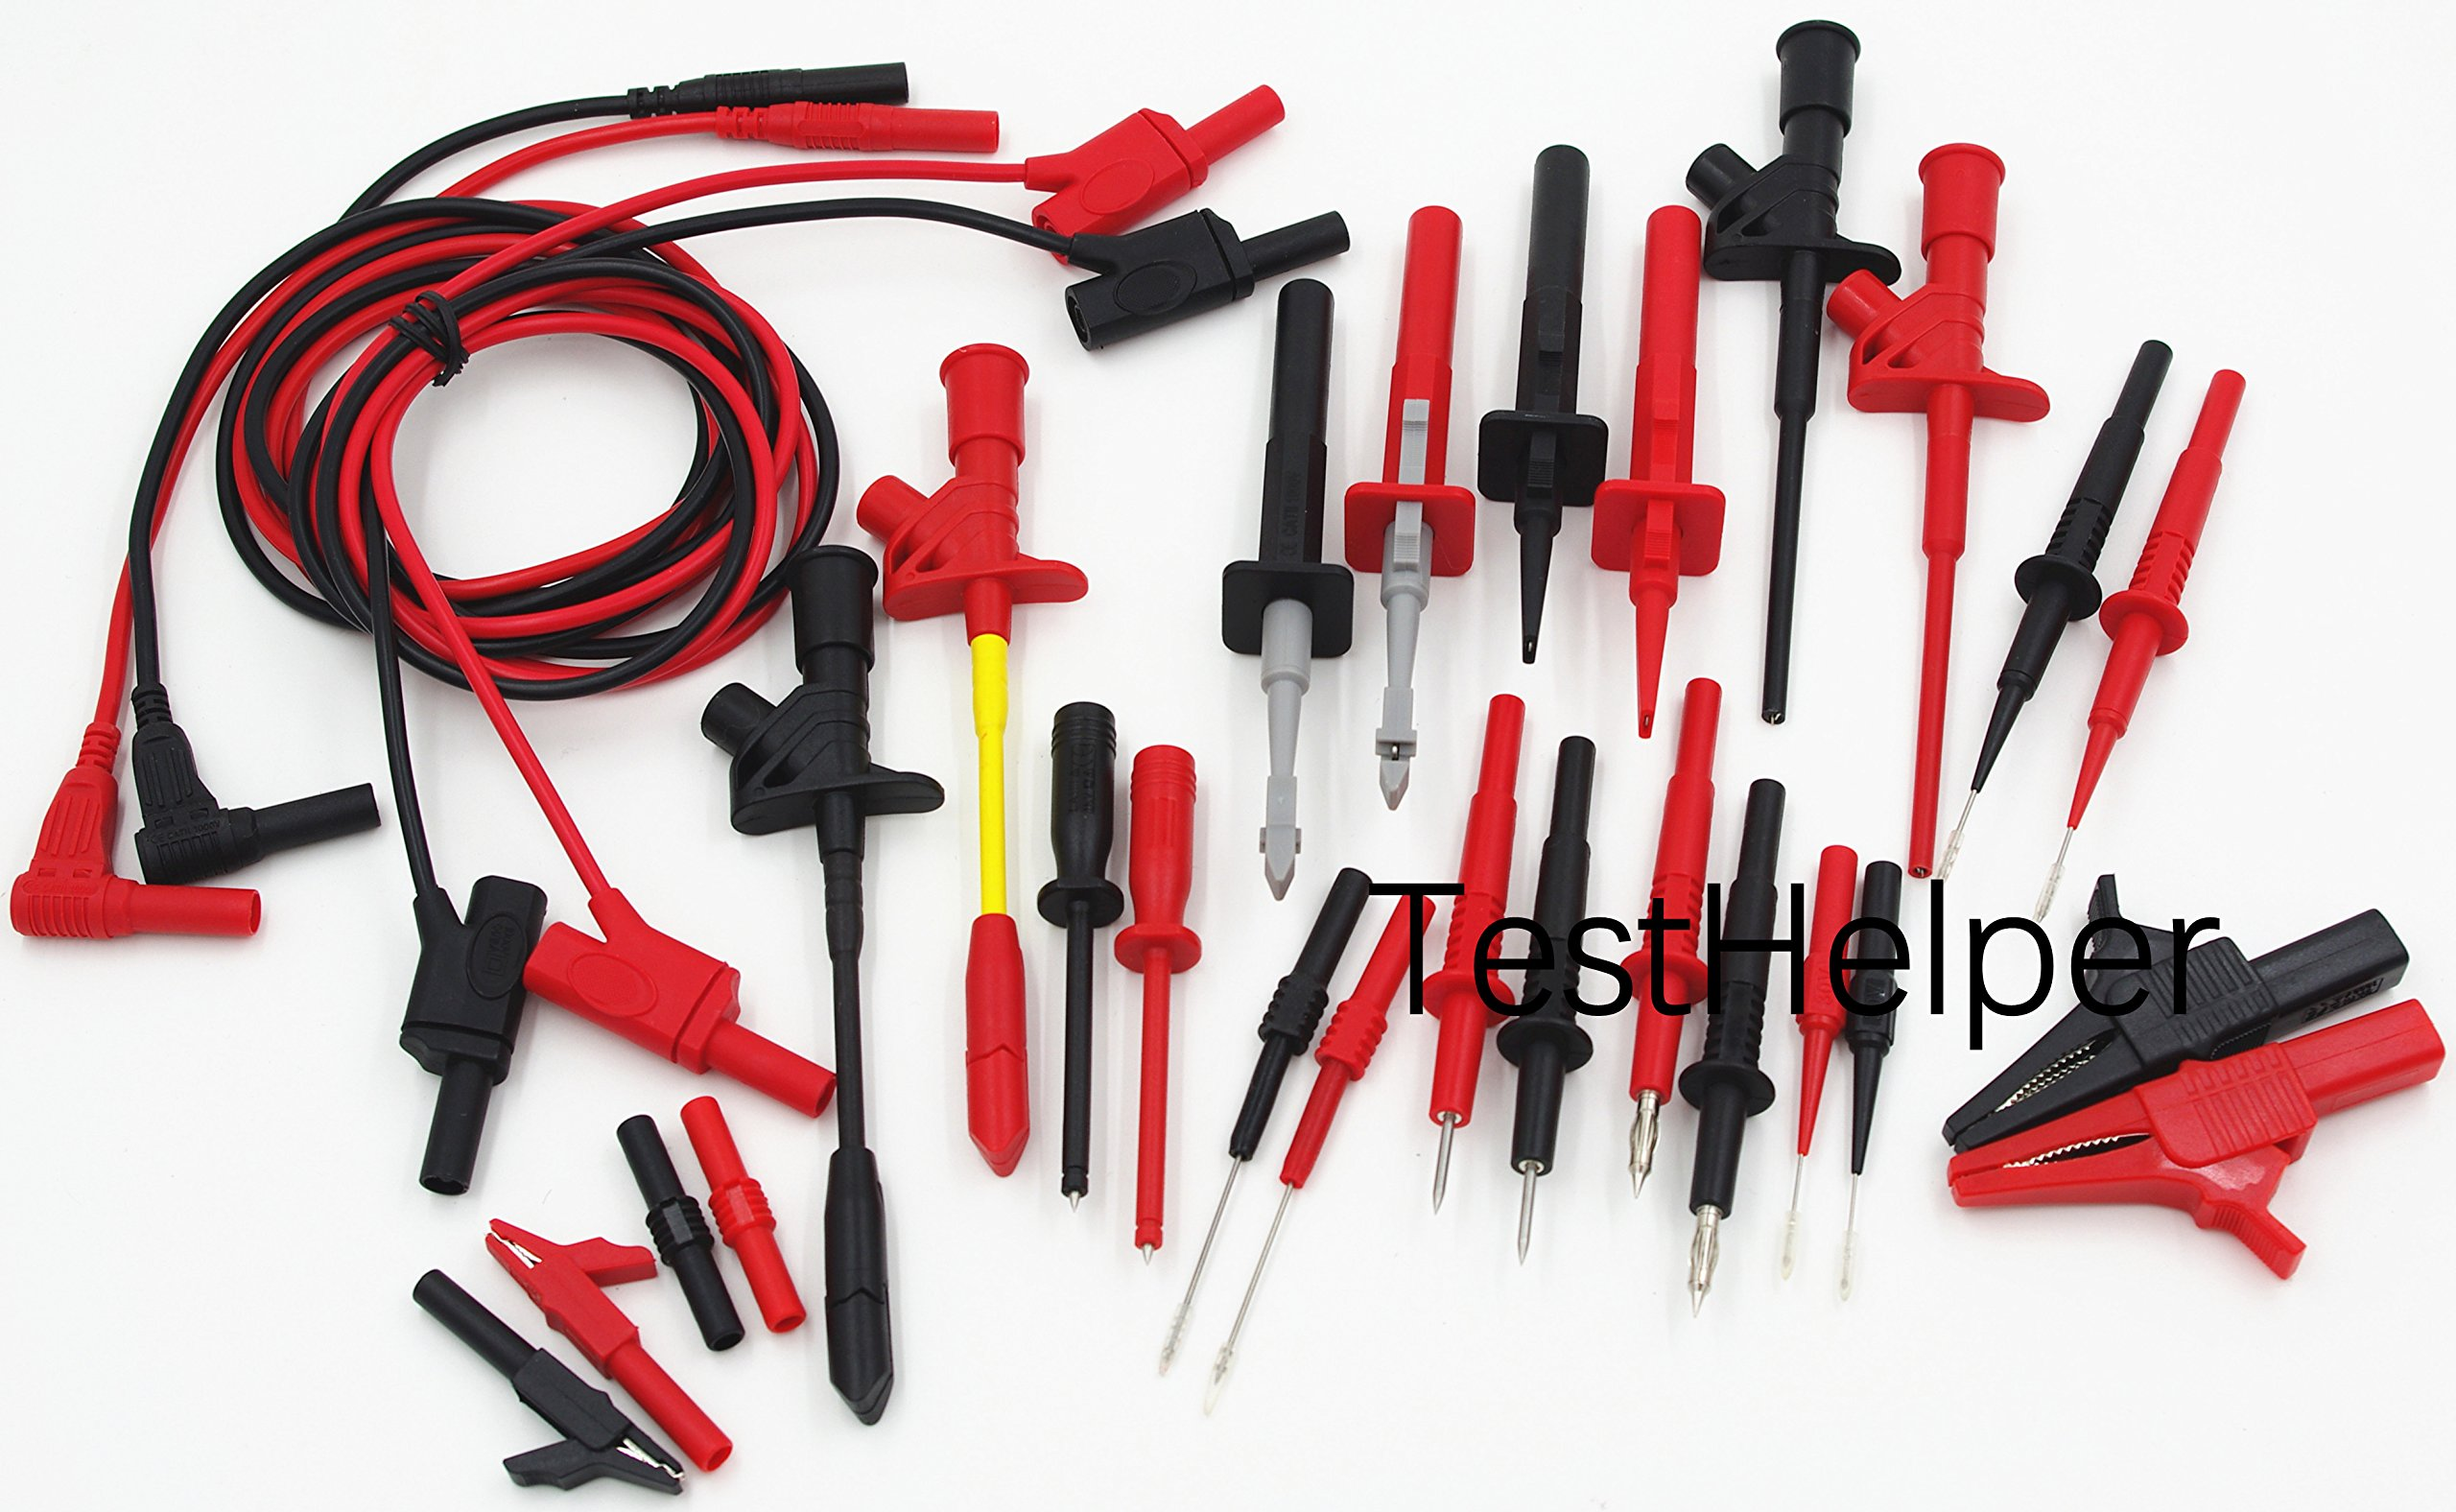 TestHelper TH-16-KIT Whole Set Multimeter Test Lead Kits Set Essential Automotive Electronic Connectors Cables Hand Tool Battery Tester & Auto Diagnostic Tools